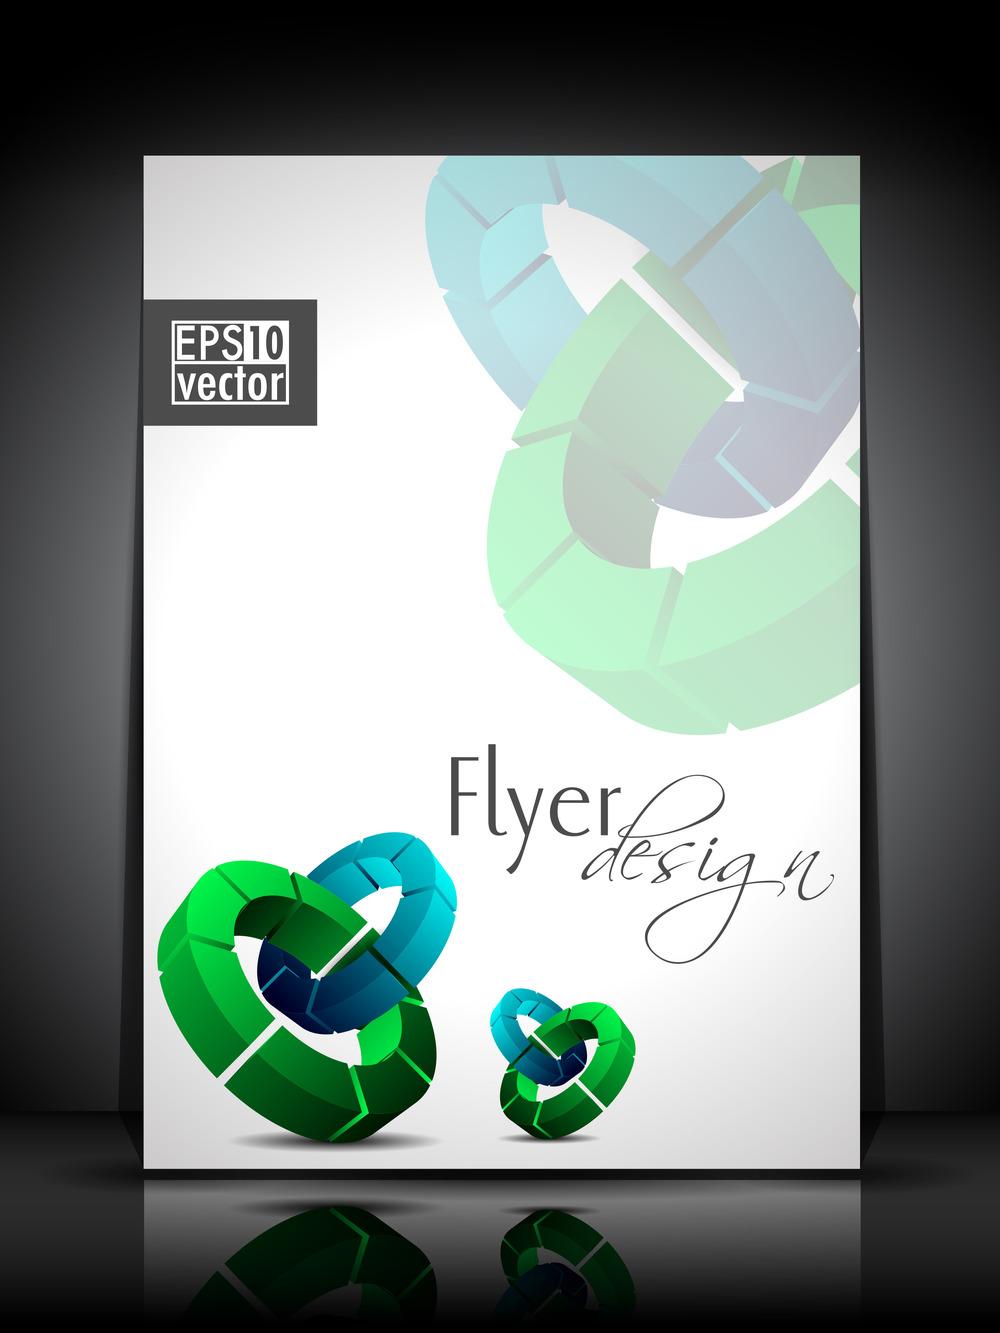 flyer_110003889-012814-int.jpg